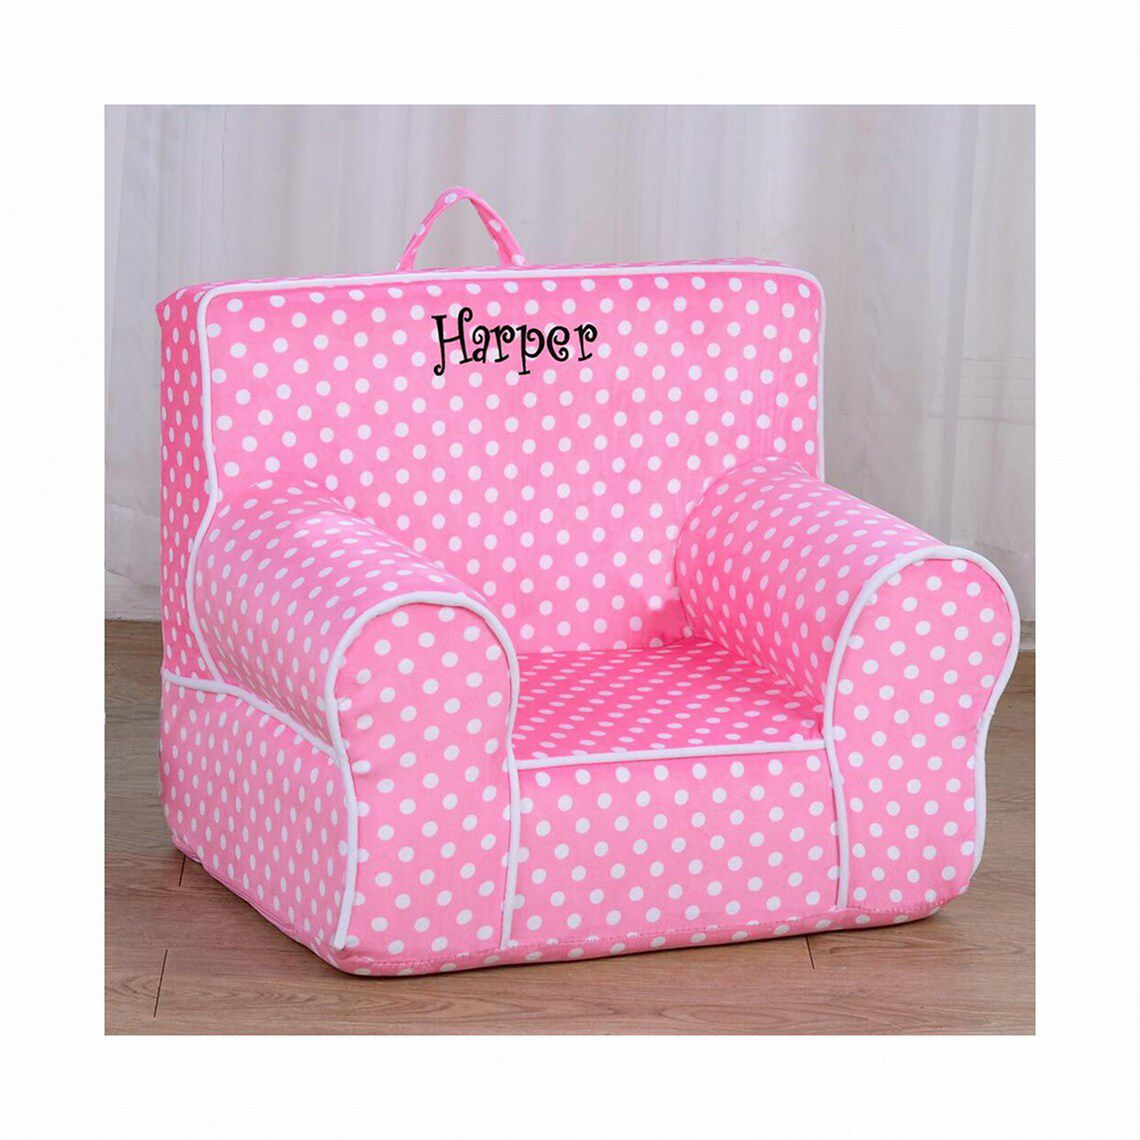 pink polka dot chair monogram of the name Harper